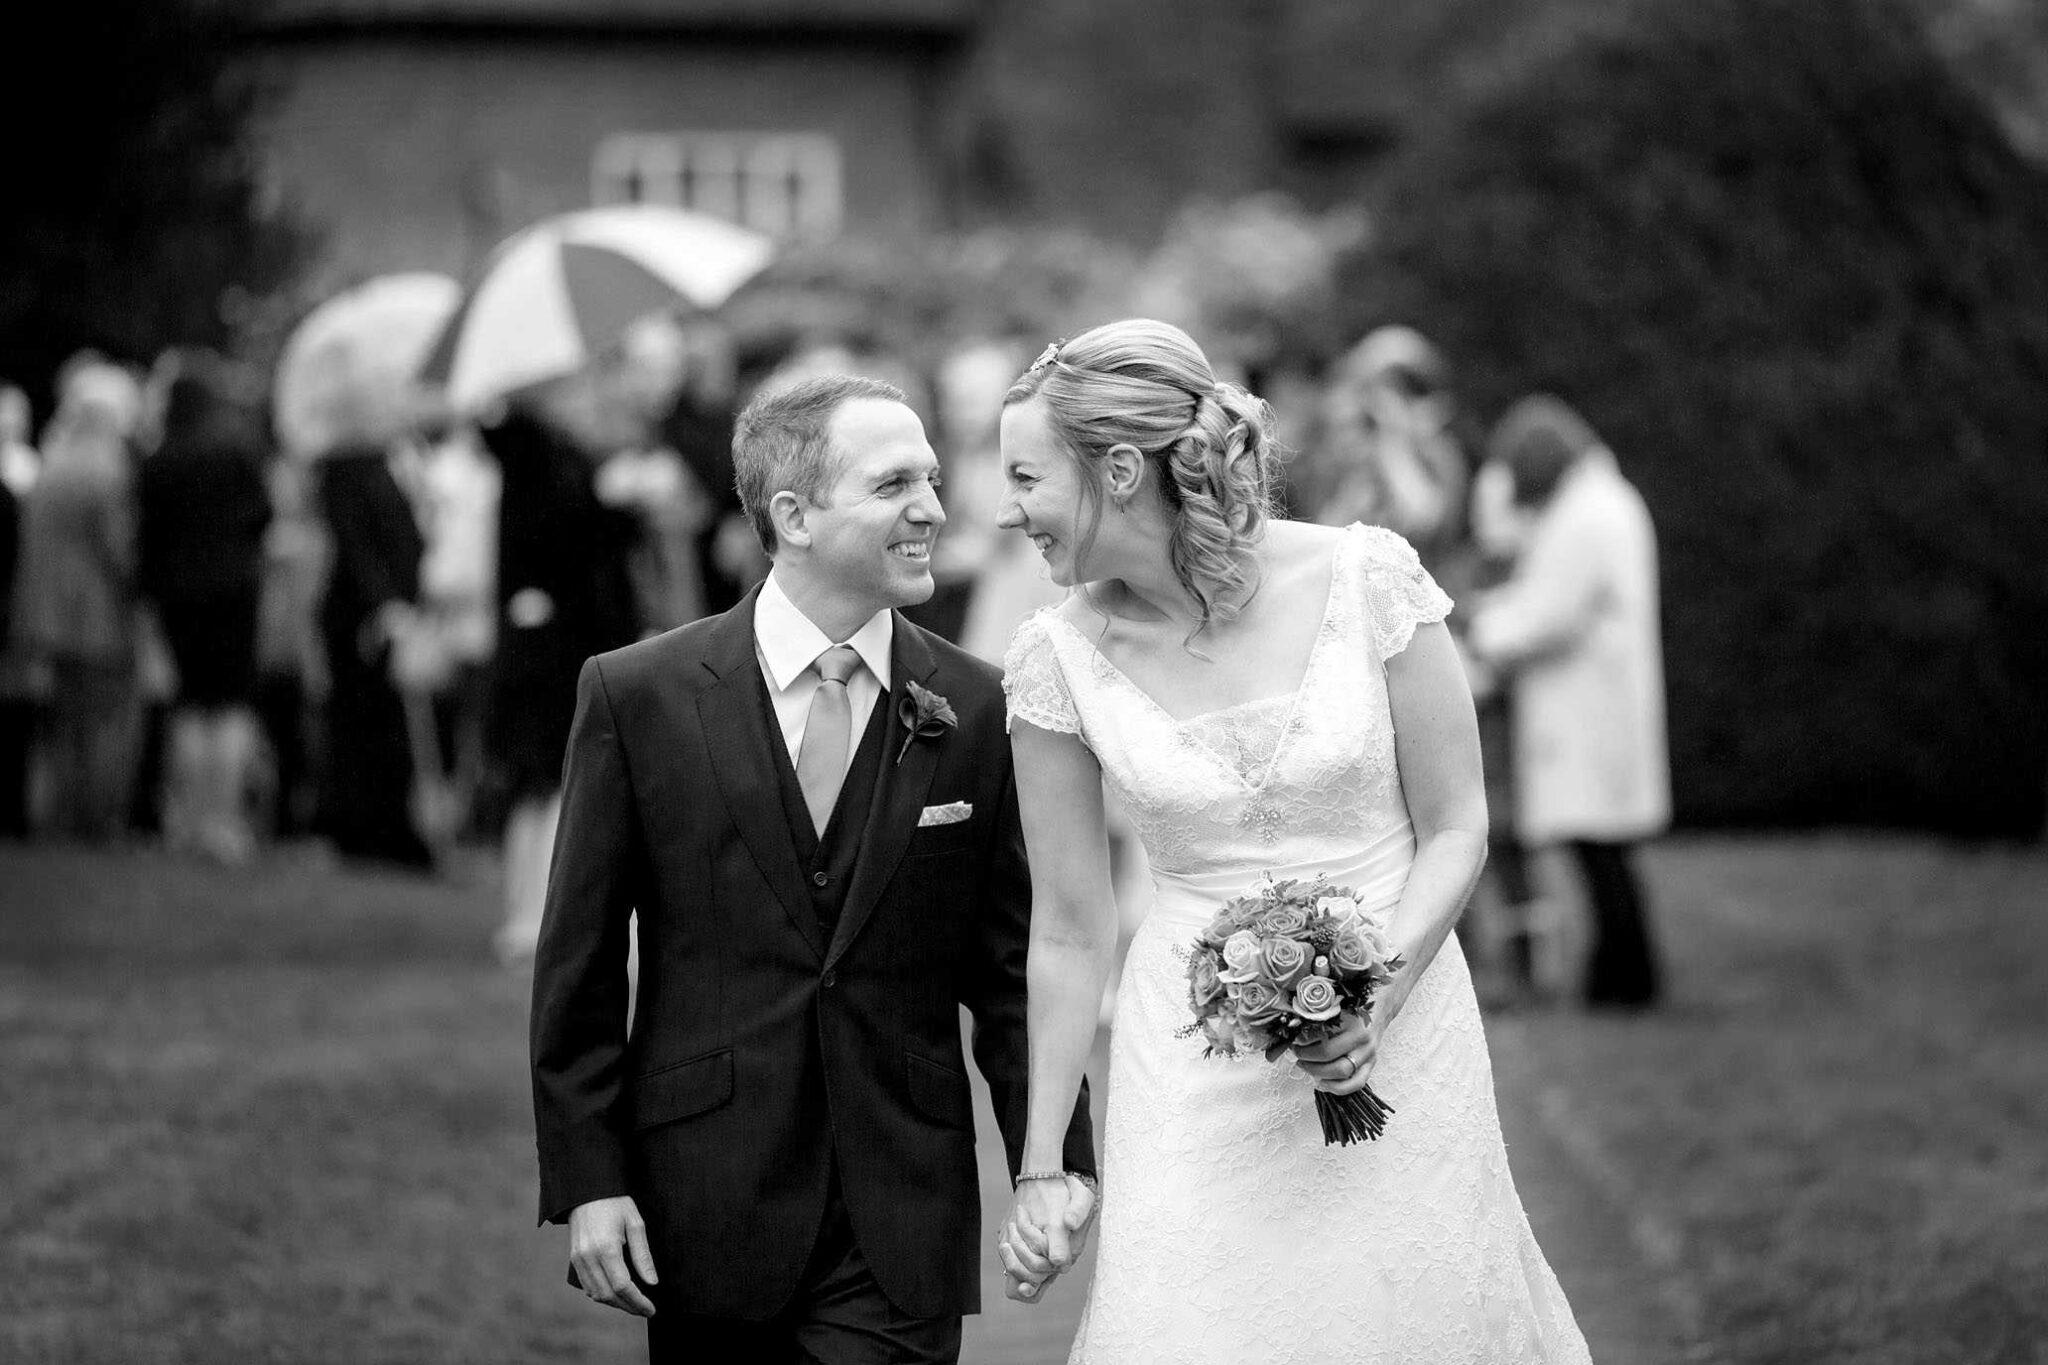 WINTER WEDDING SOUTH FARM OF KAREN & ALEX